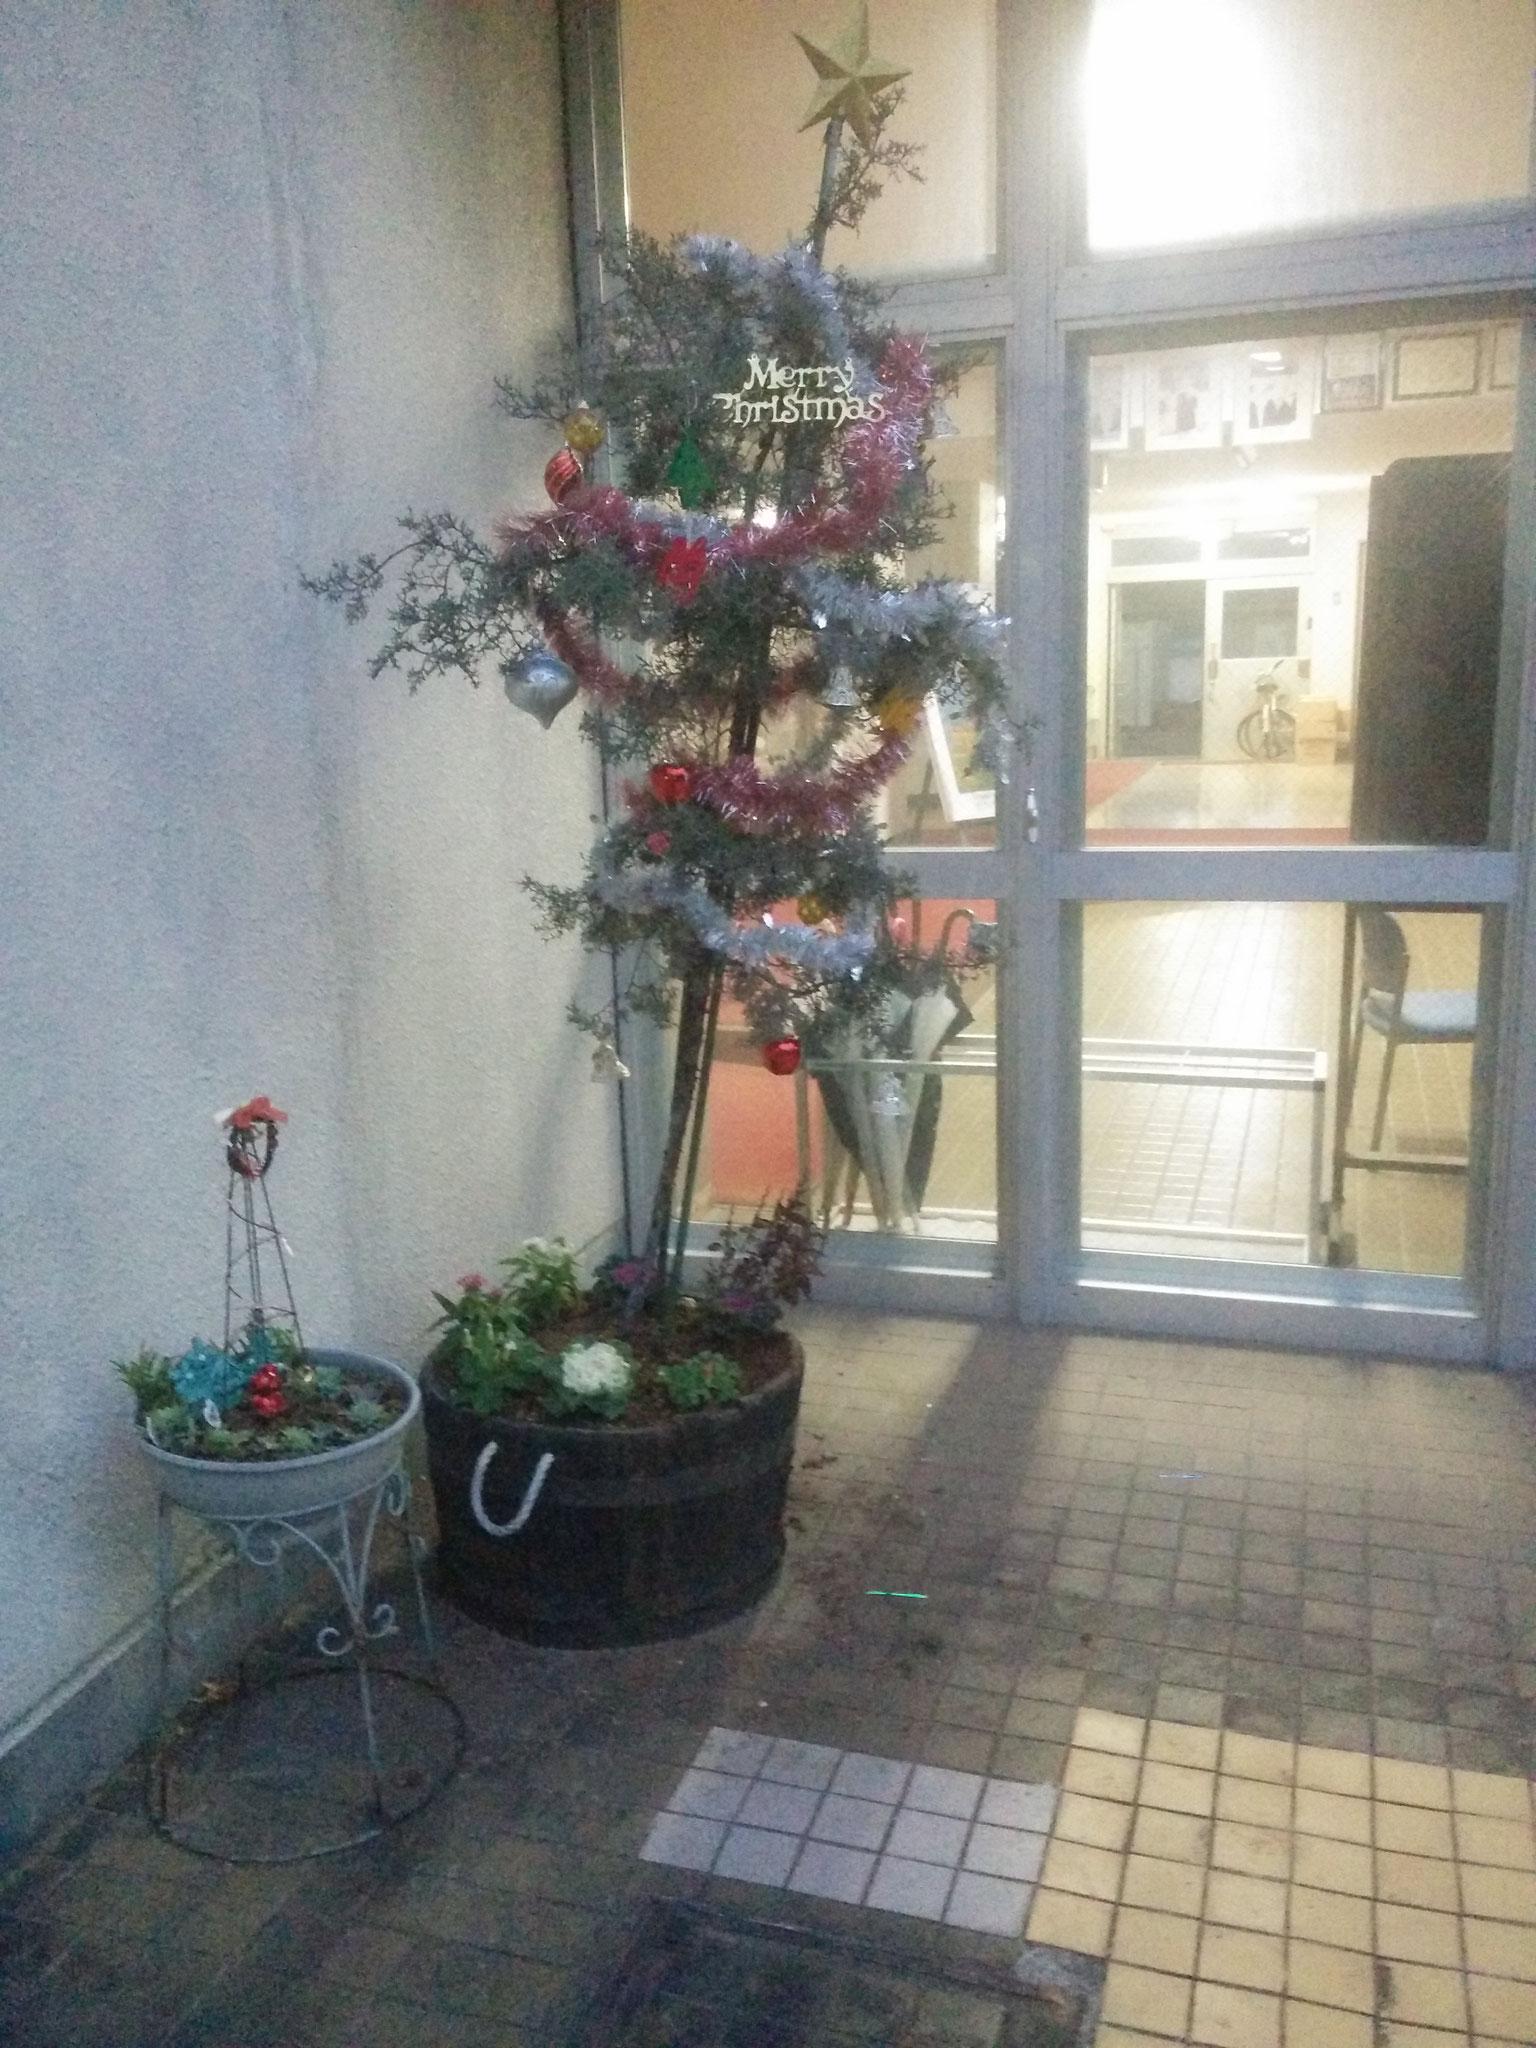 4 one of the schools christmas tree (Yamato Nishi Senior High)